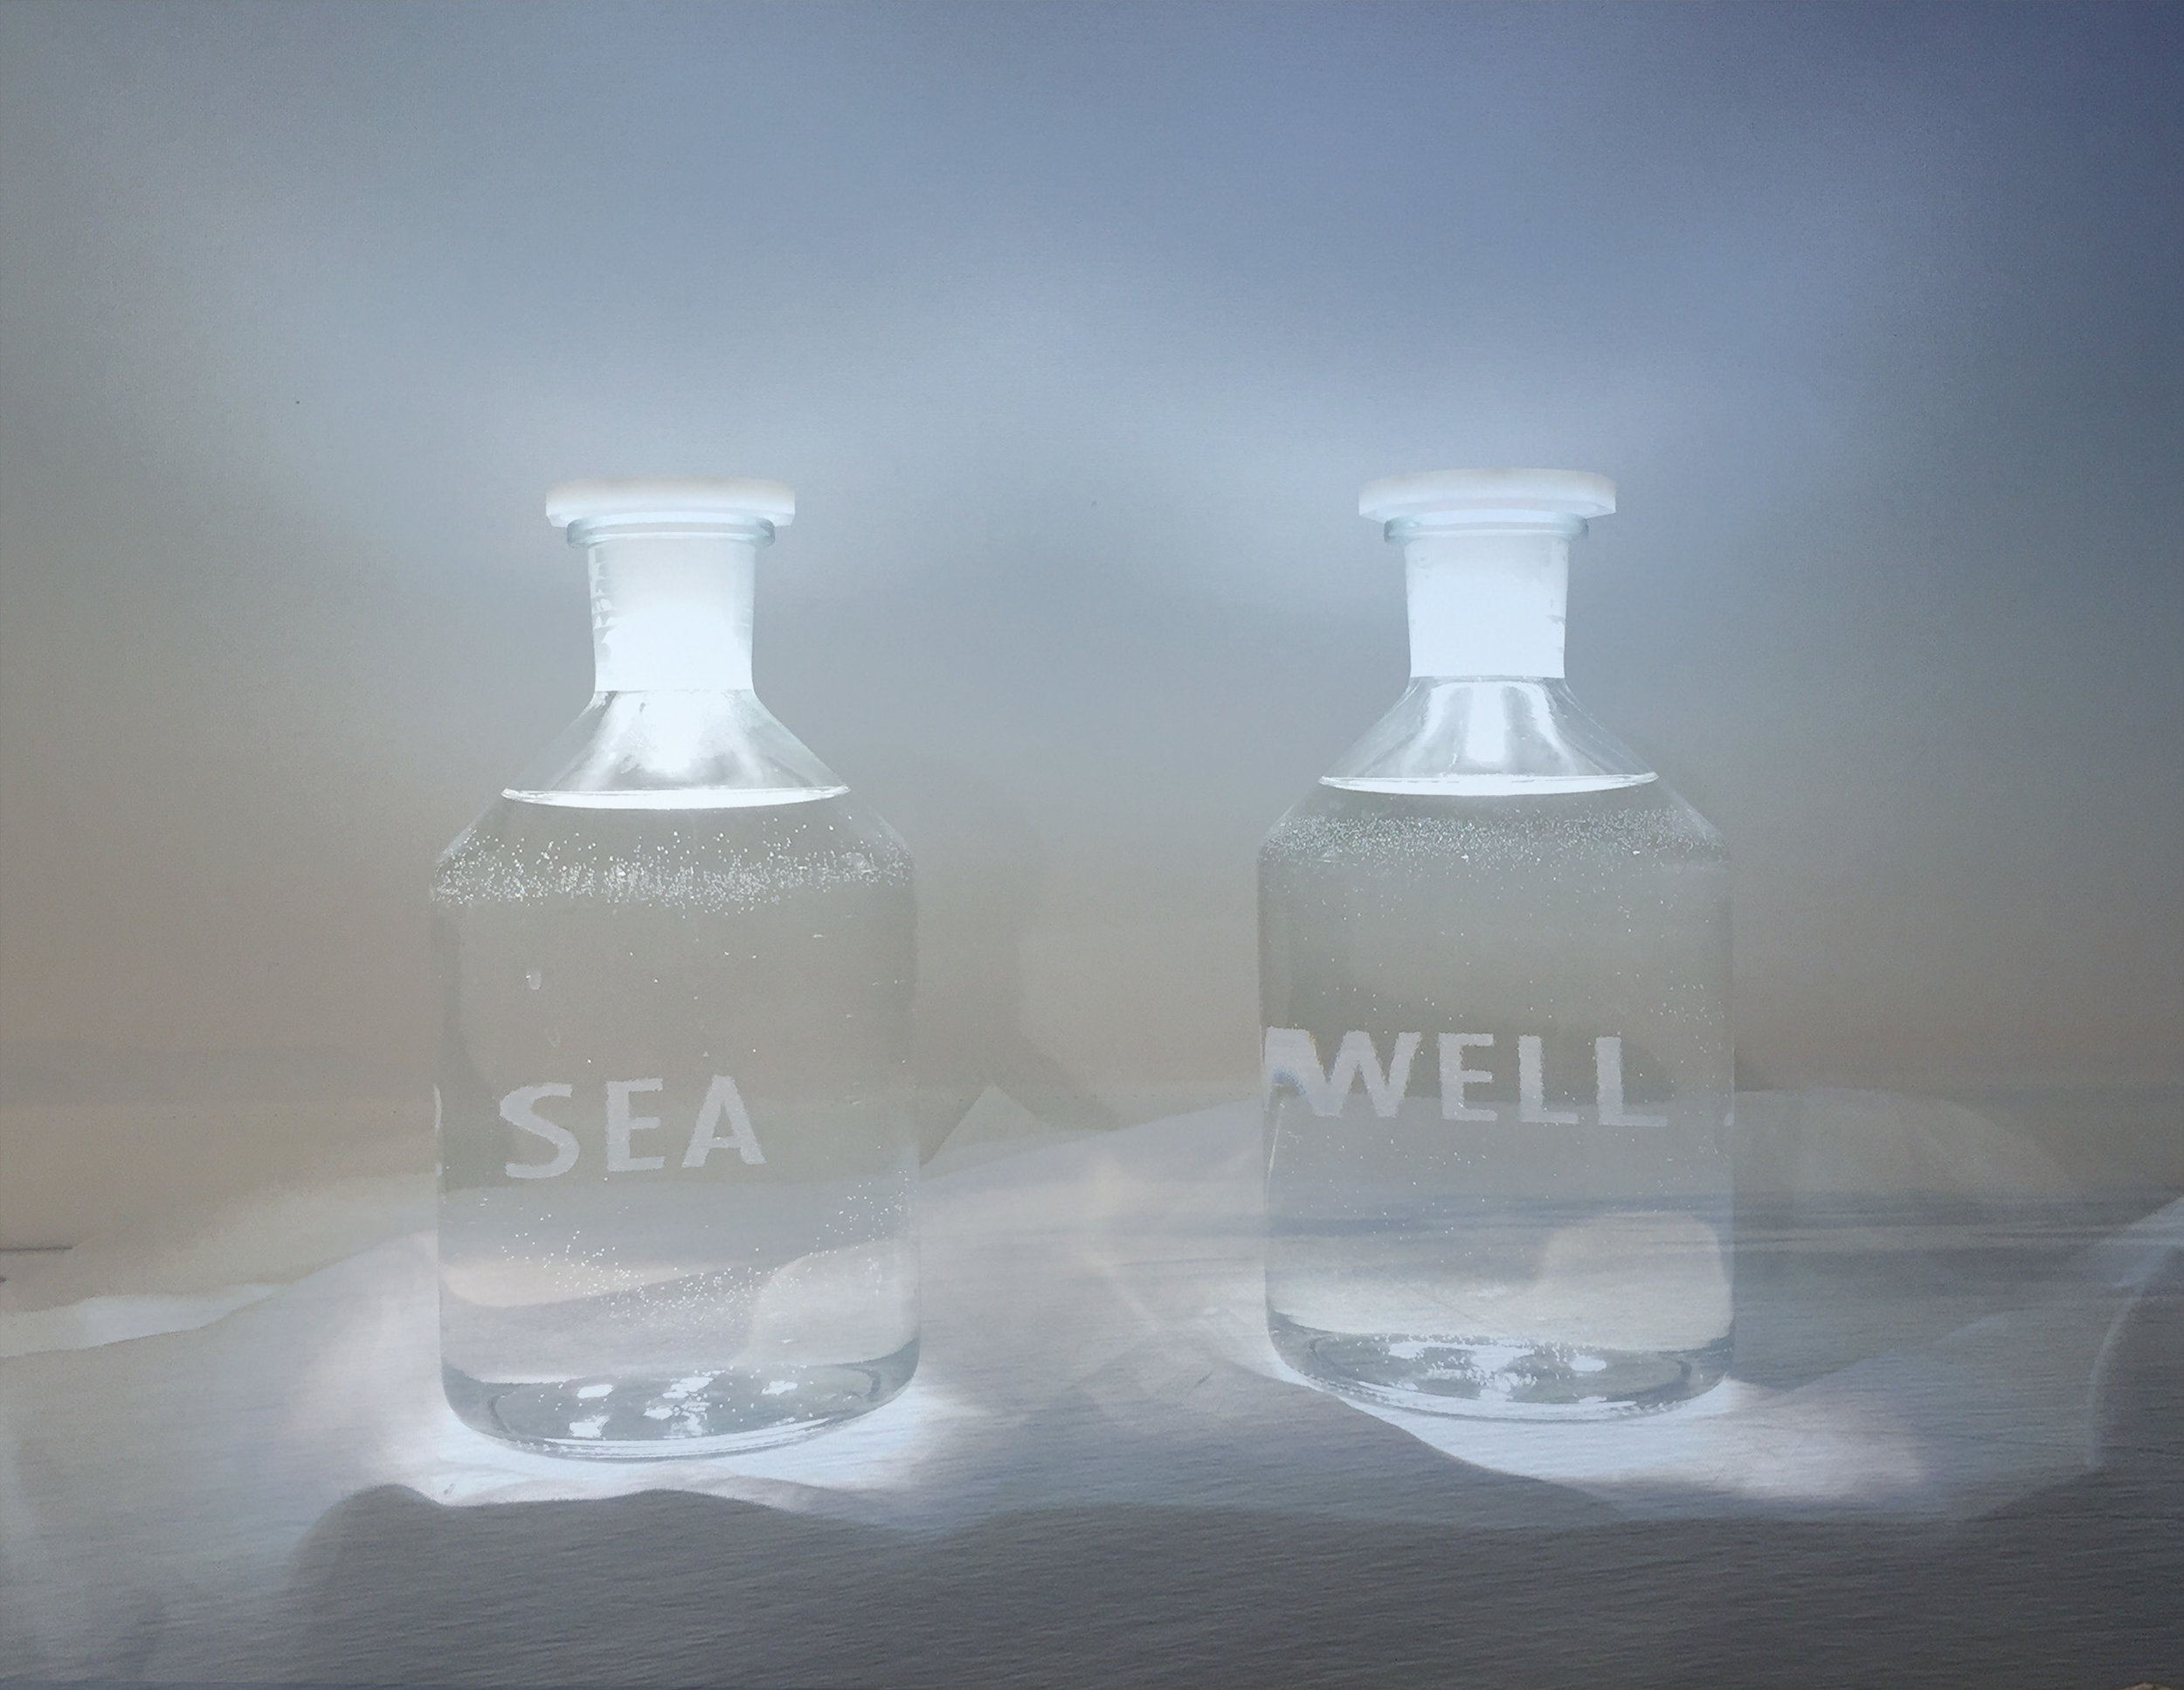 SEA WELL, 2017  Fresh water, sea water (Finisterra, Spain), glass, light